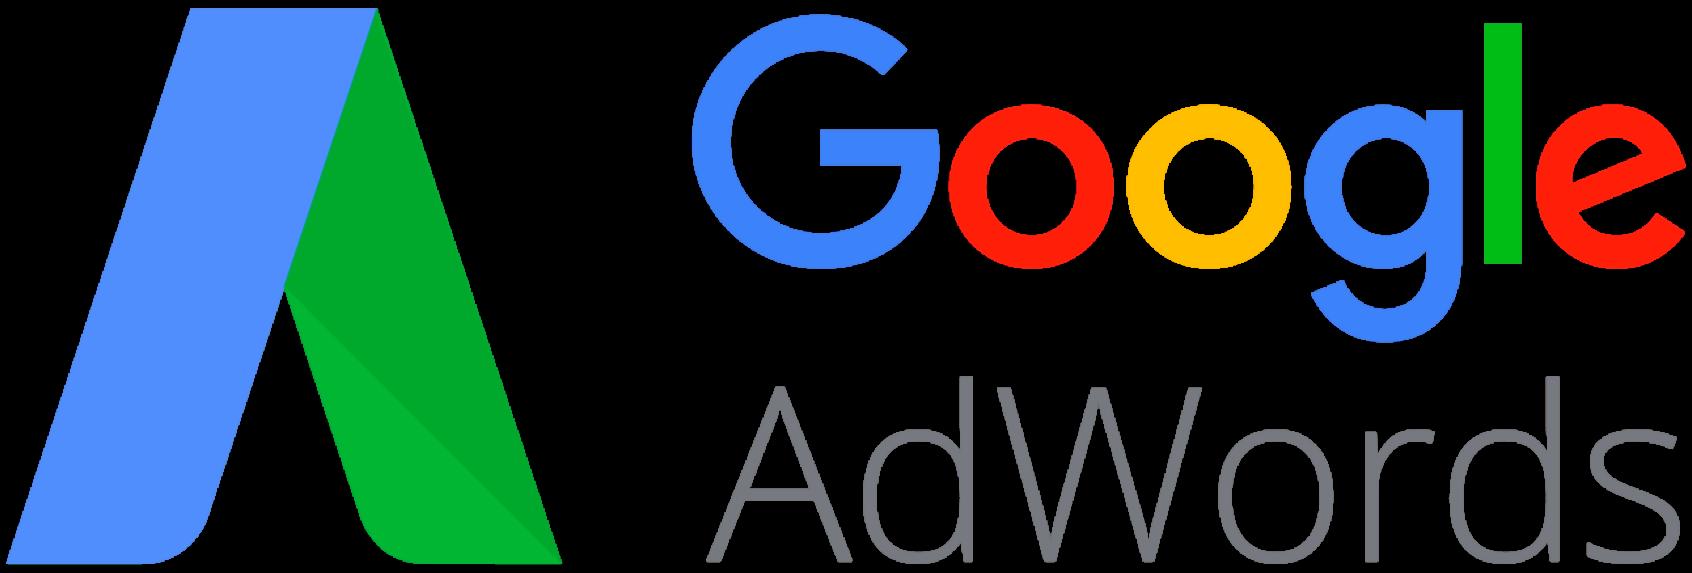 NEW GOOGLE ADWORDS LOGO PNG 2019 · eDigital.